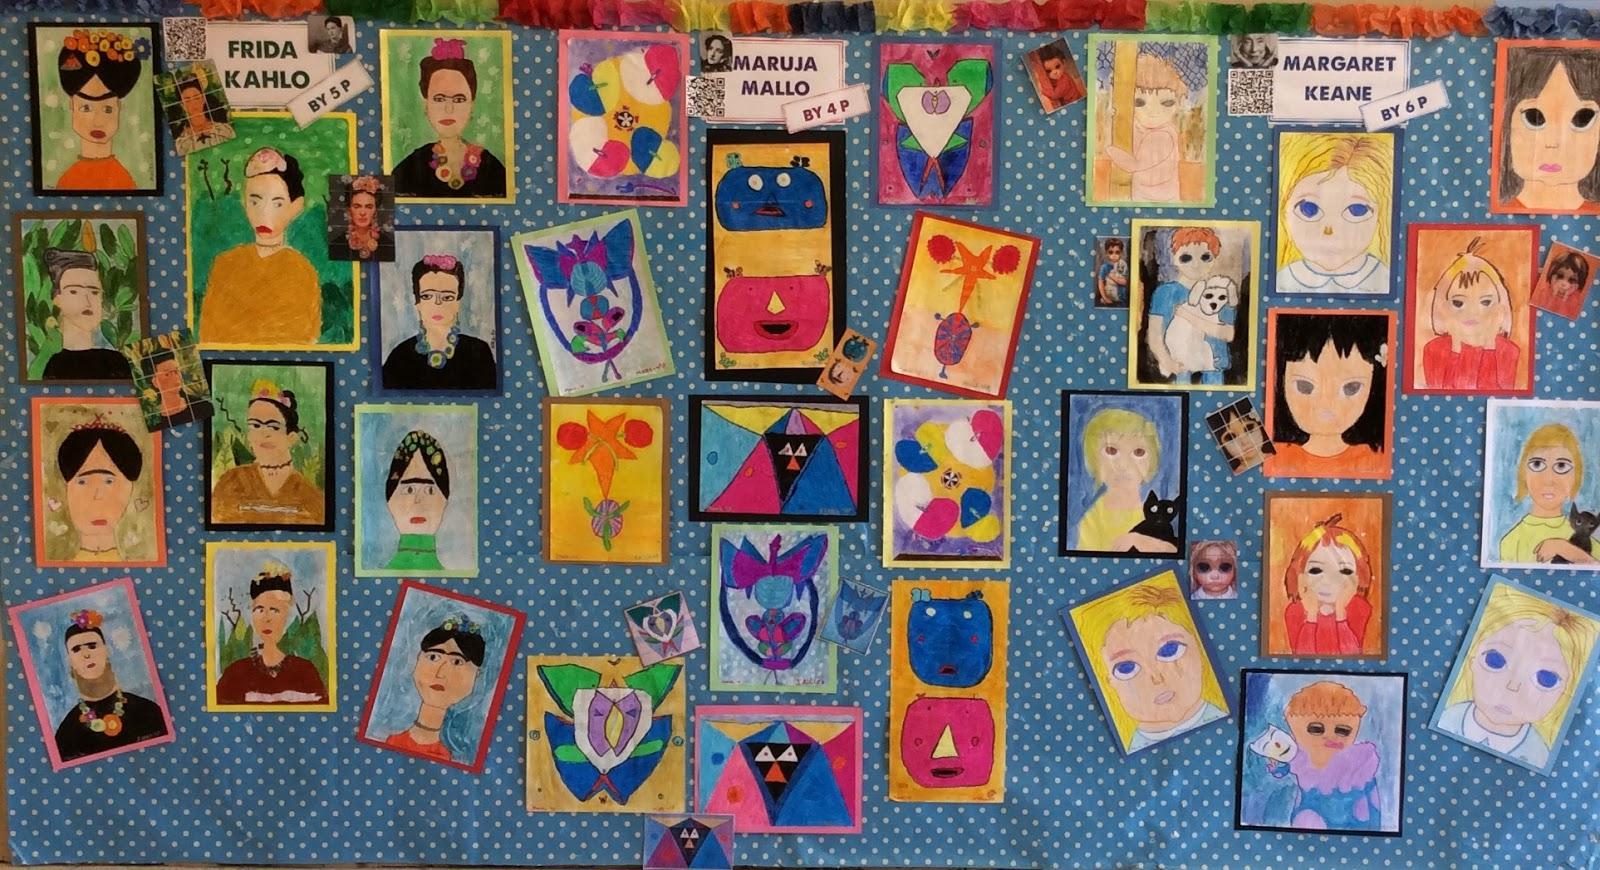 hello teacher women artists inspiration georgia o keeffe maruja